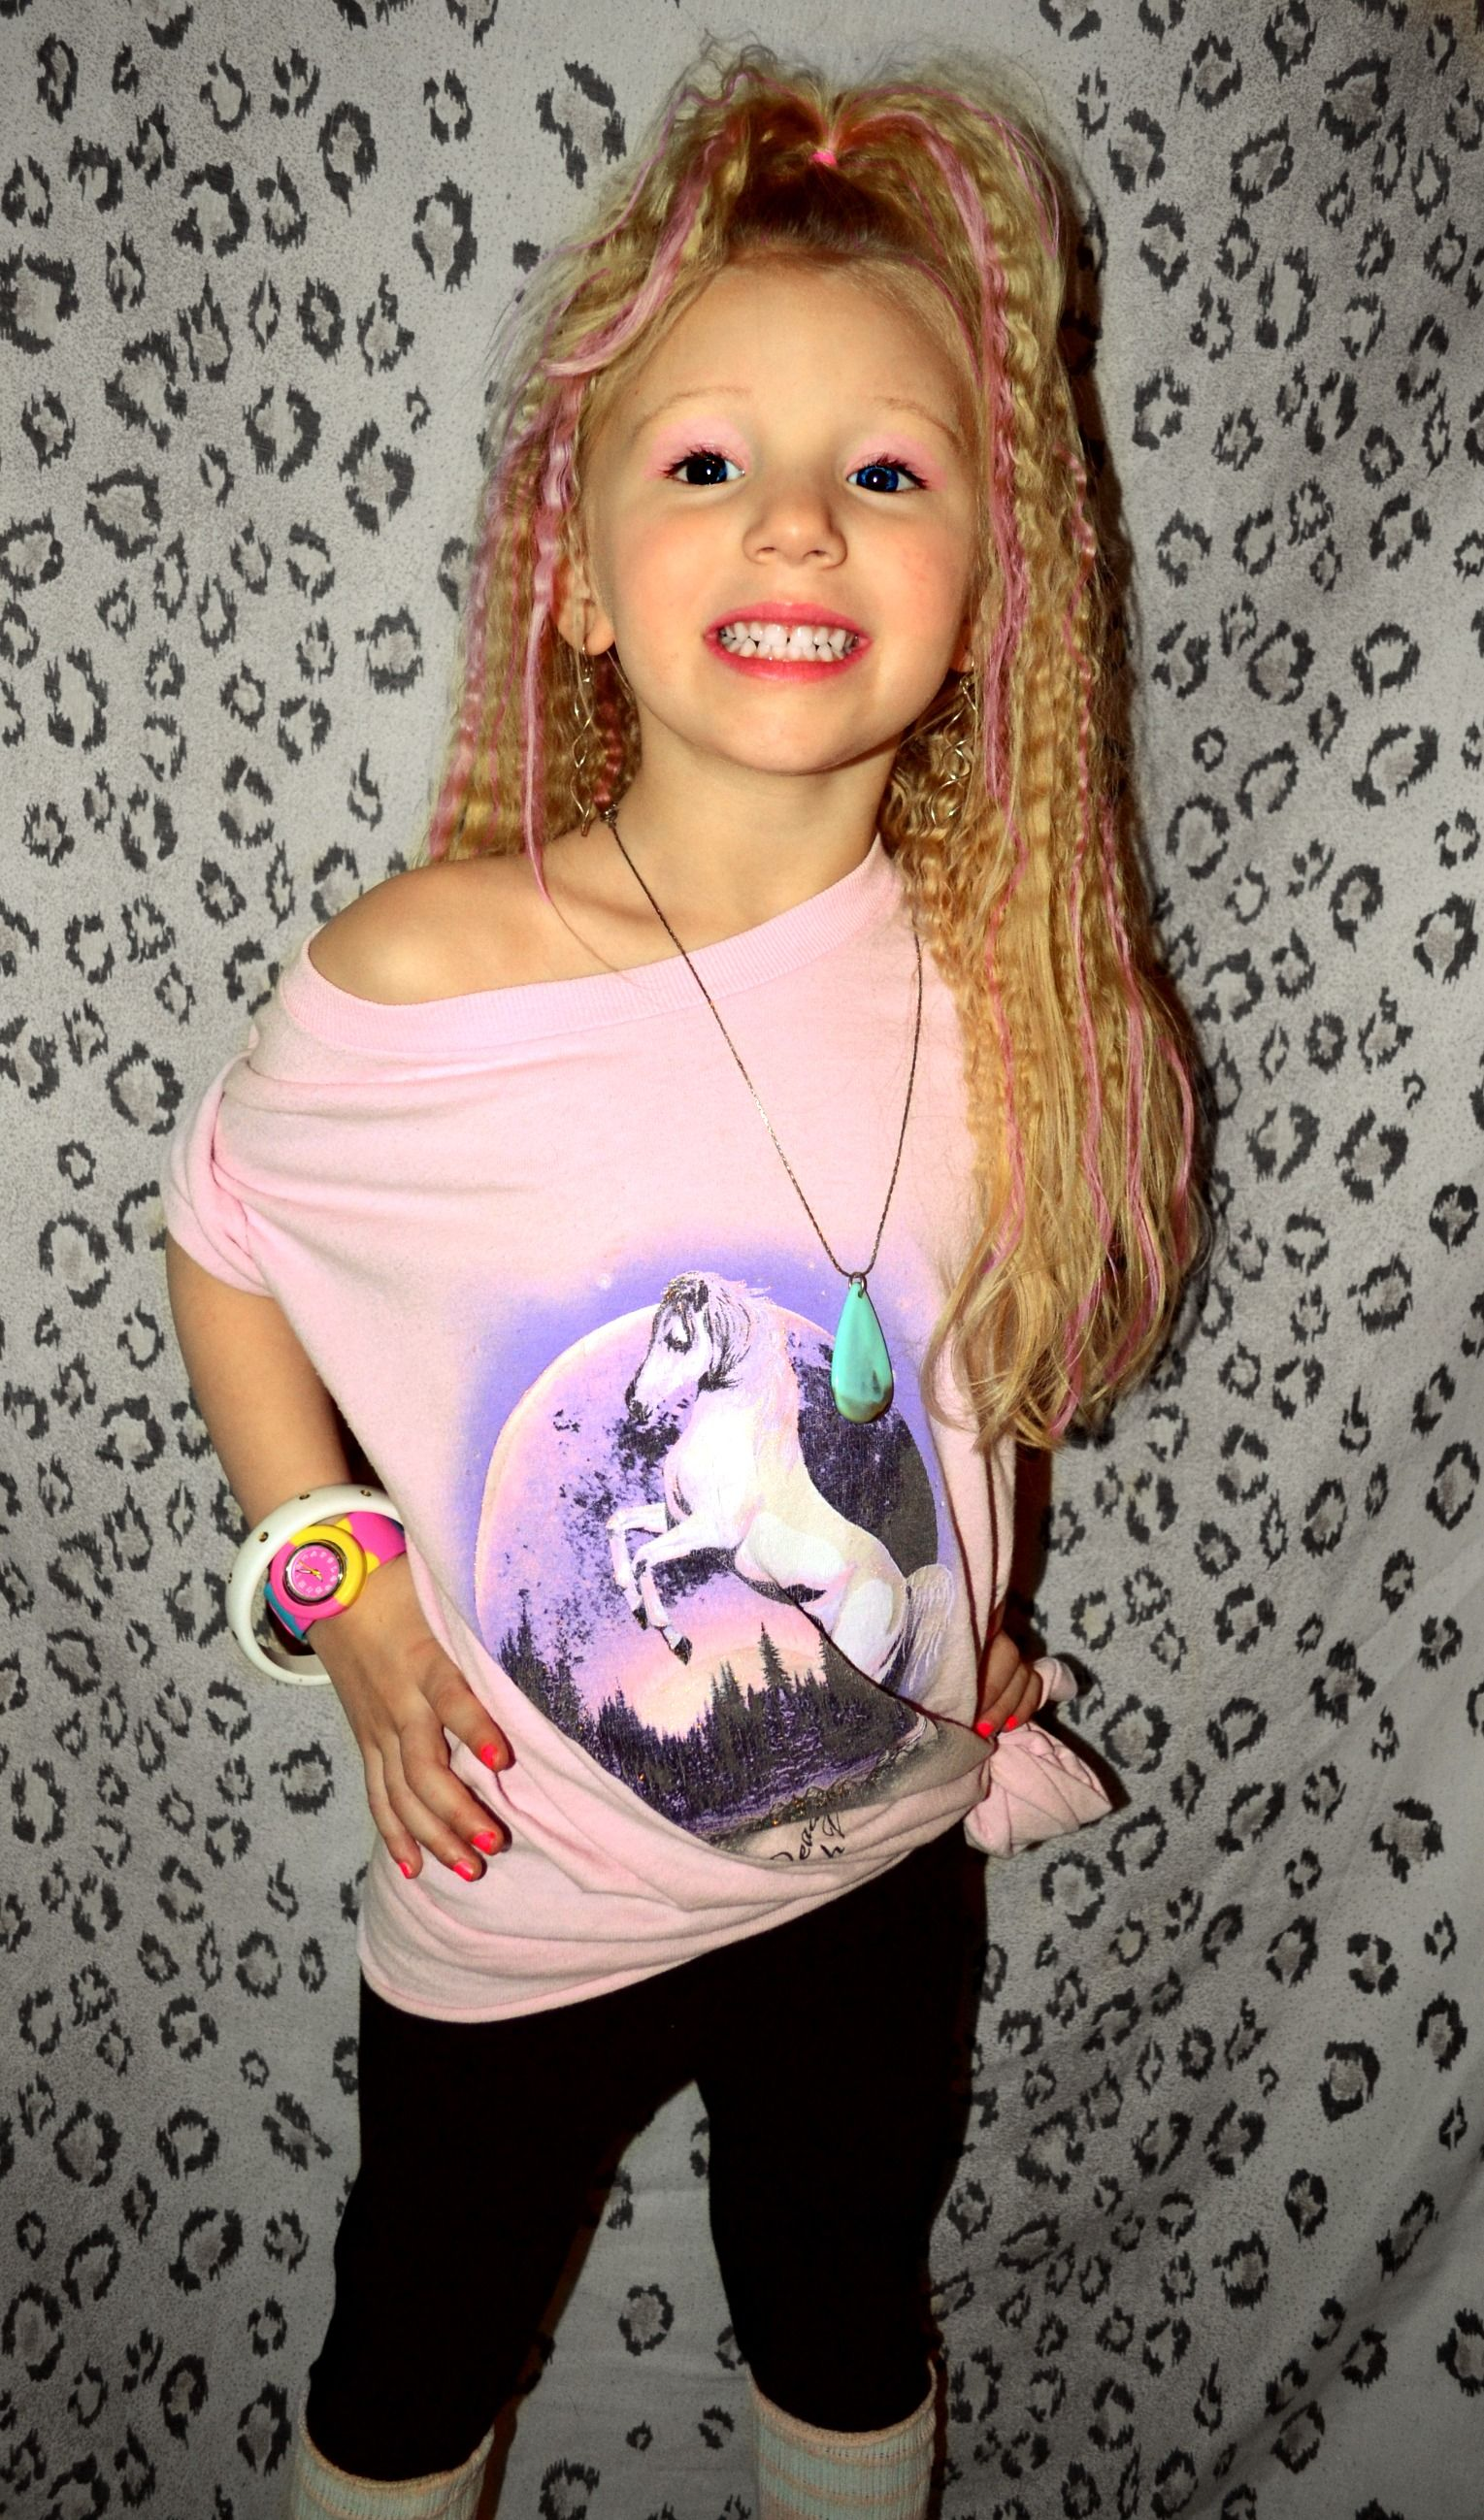 80's toddler aerobics hair & clothing! ;) Little miss Jane Fonda! haha